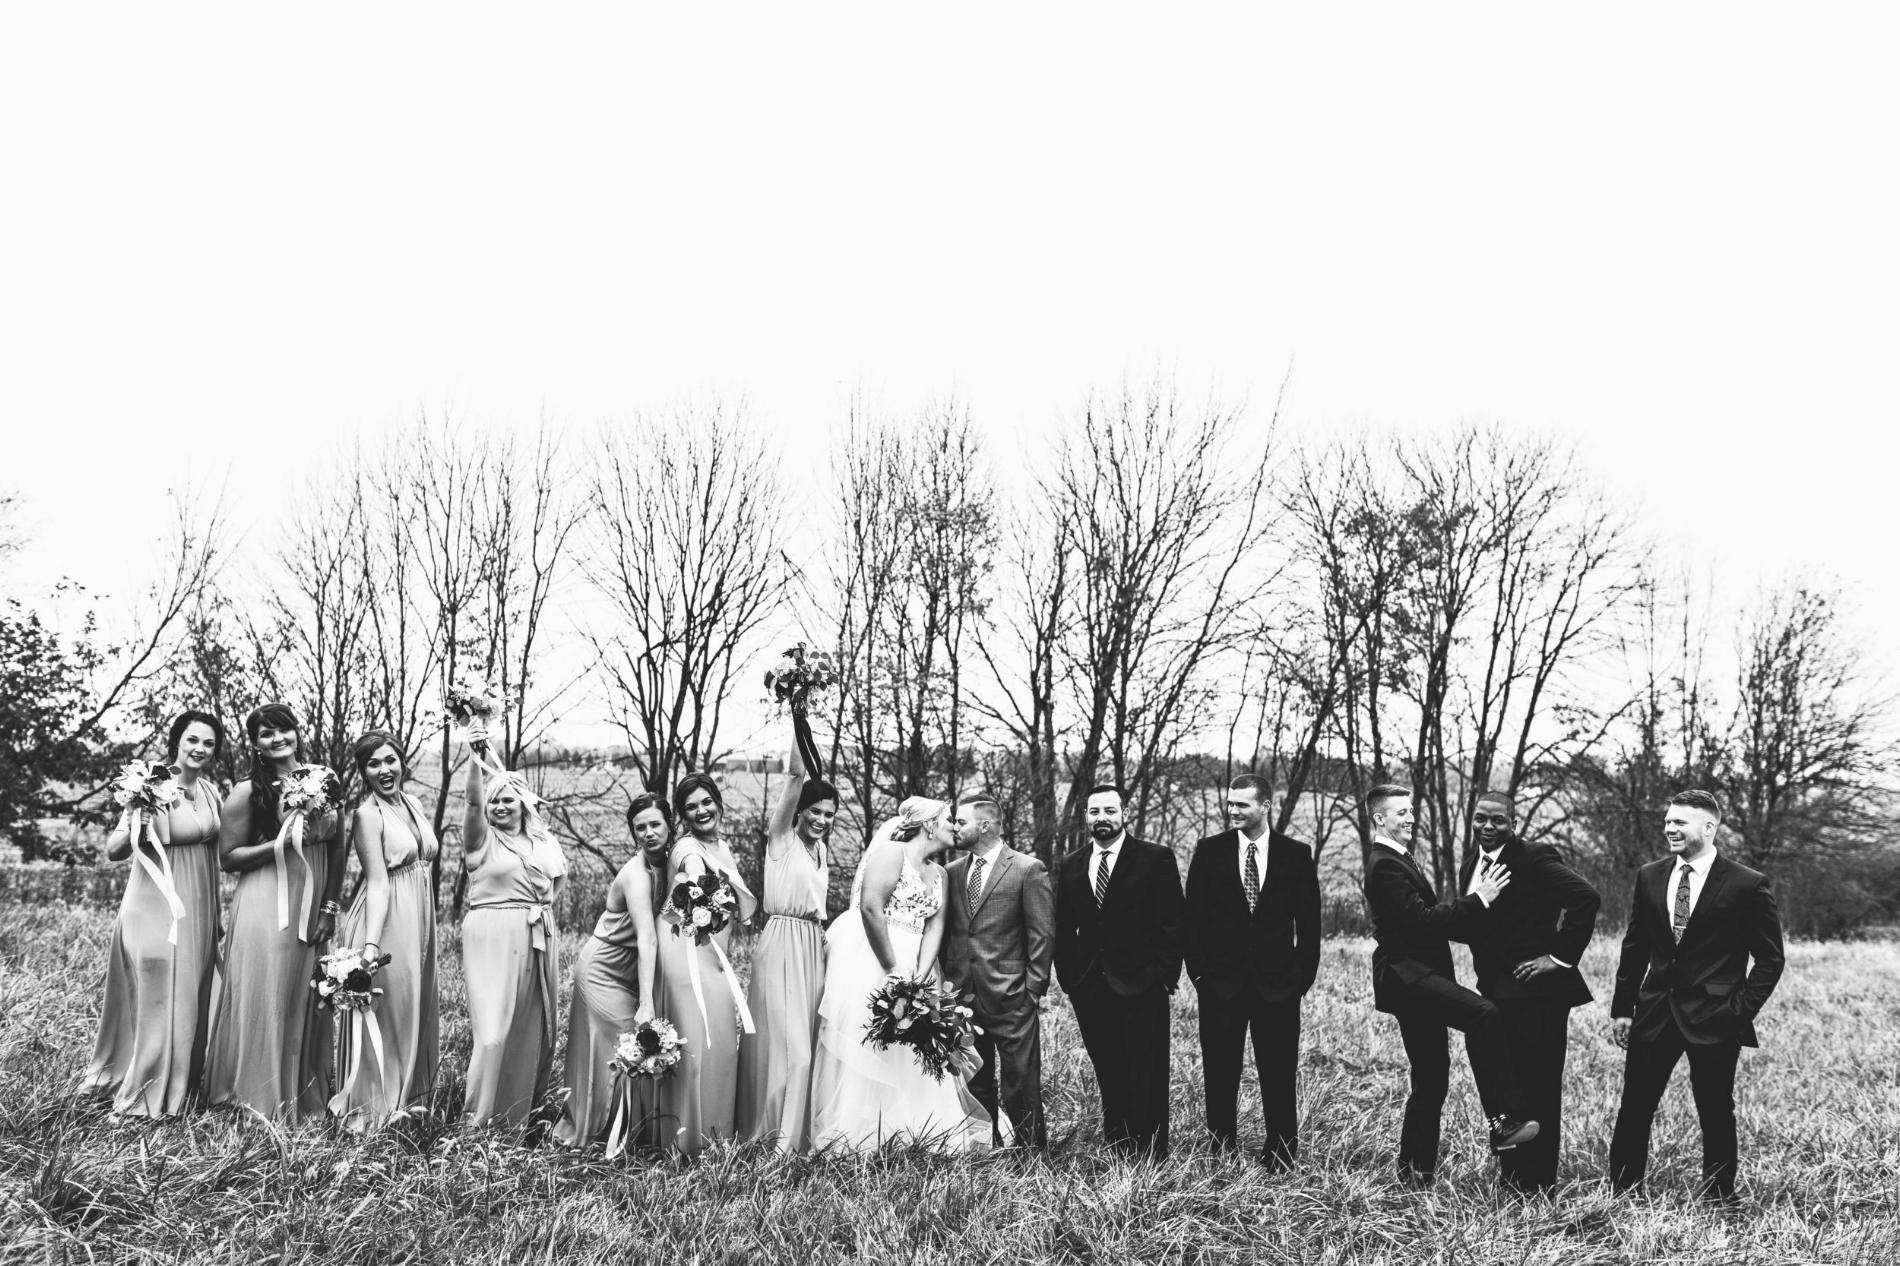 BridesbyYoung-Curvy-BlushHayleyPaige-Madi-Wedding-Inspiration-28.jpg